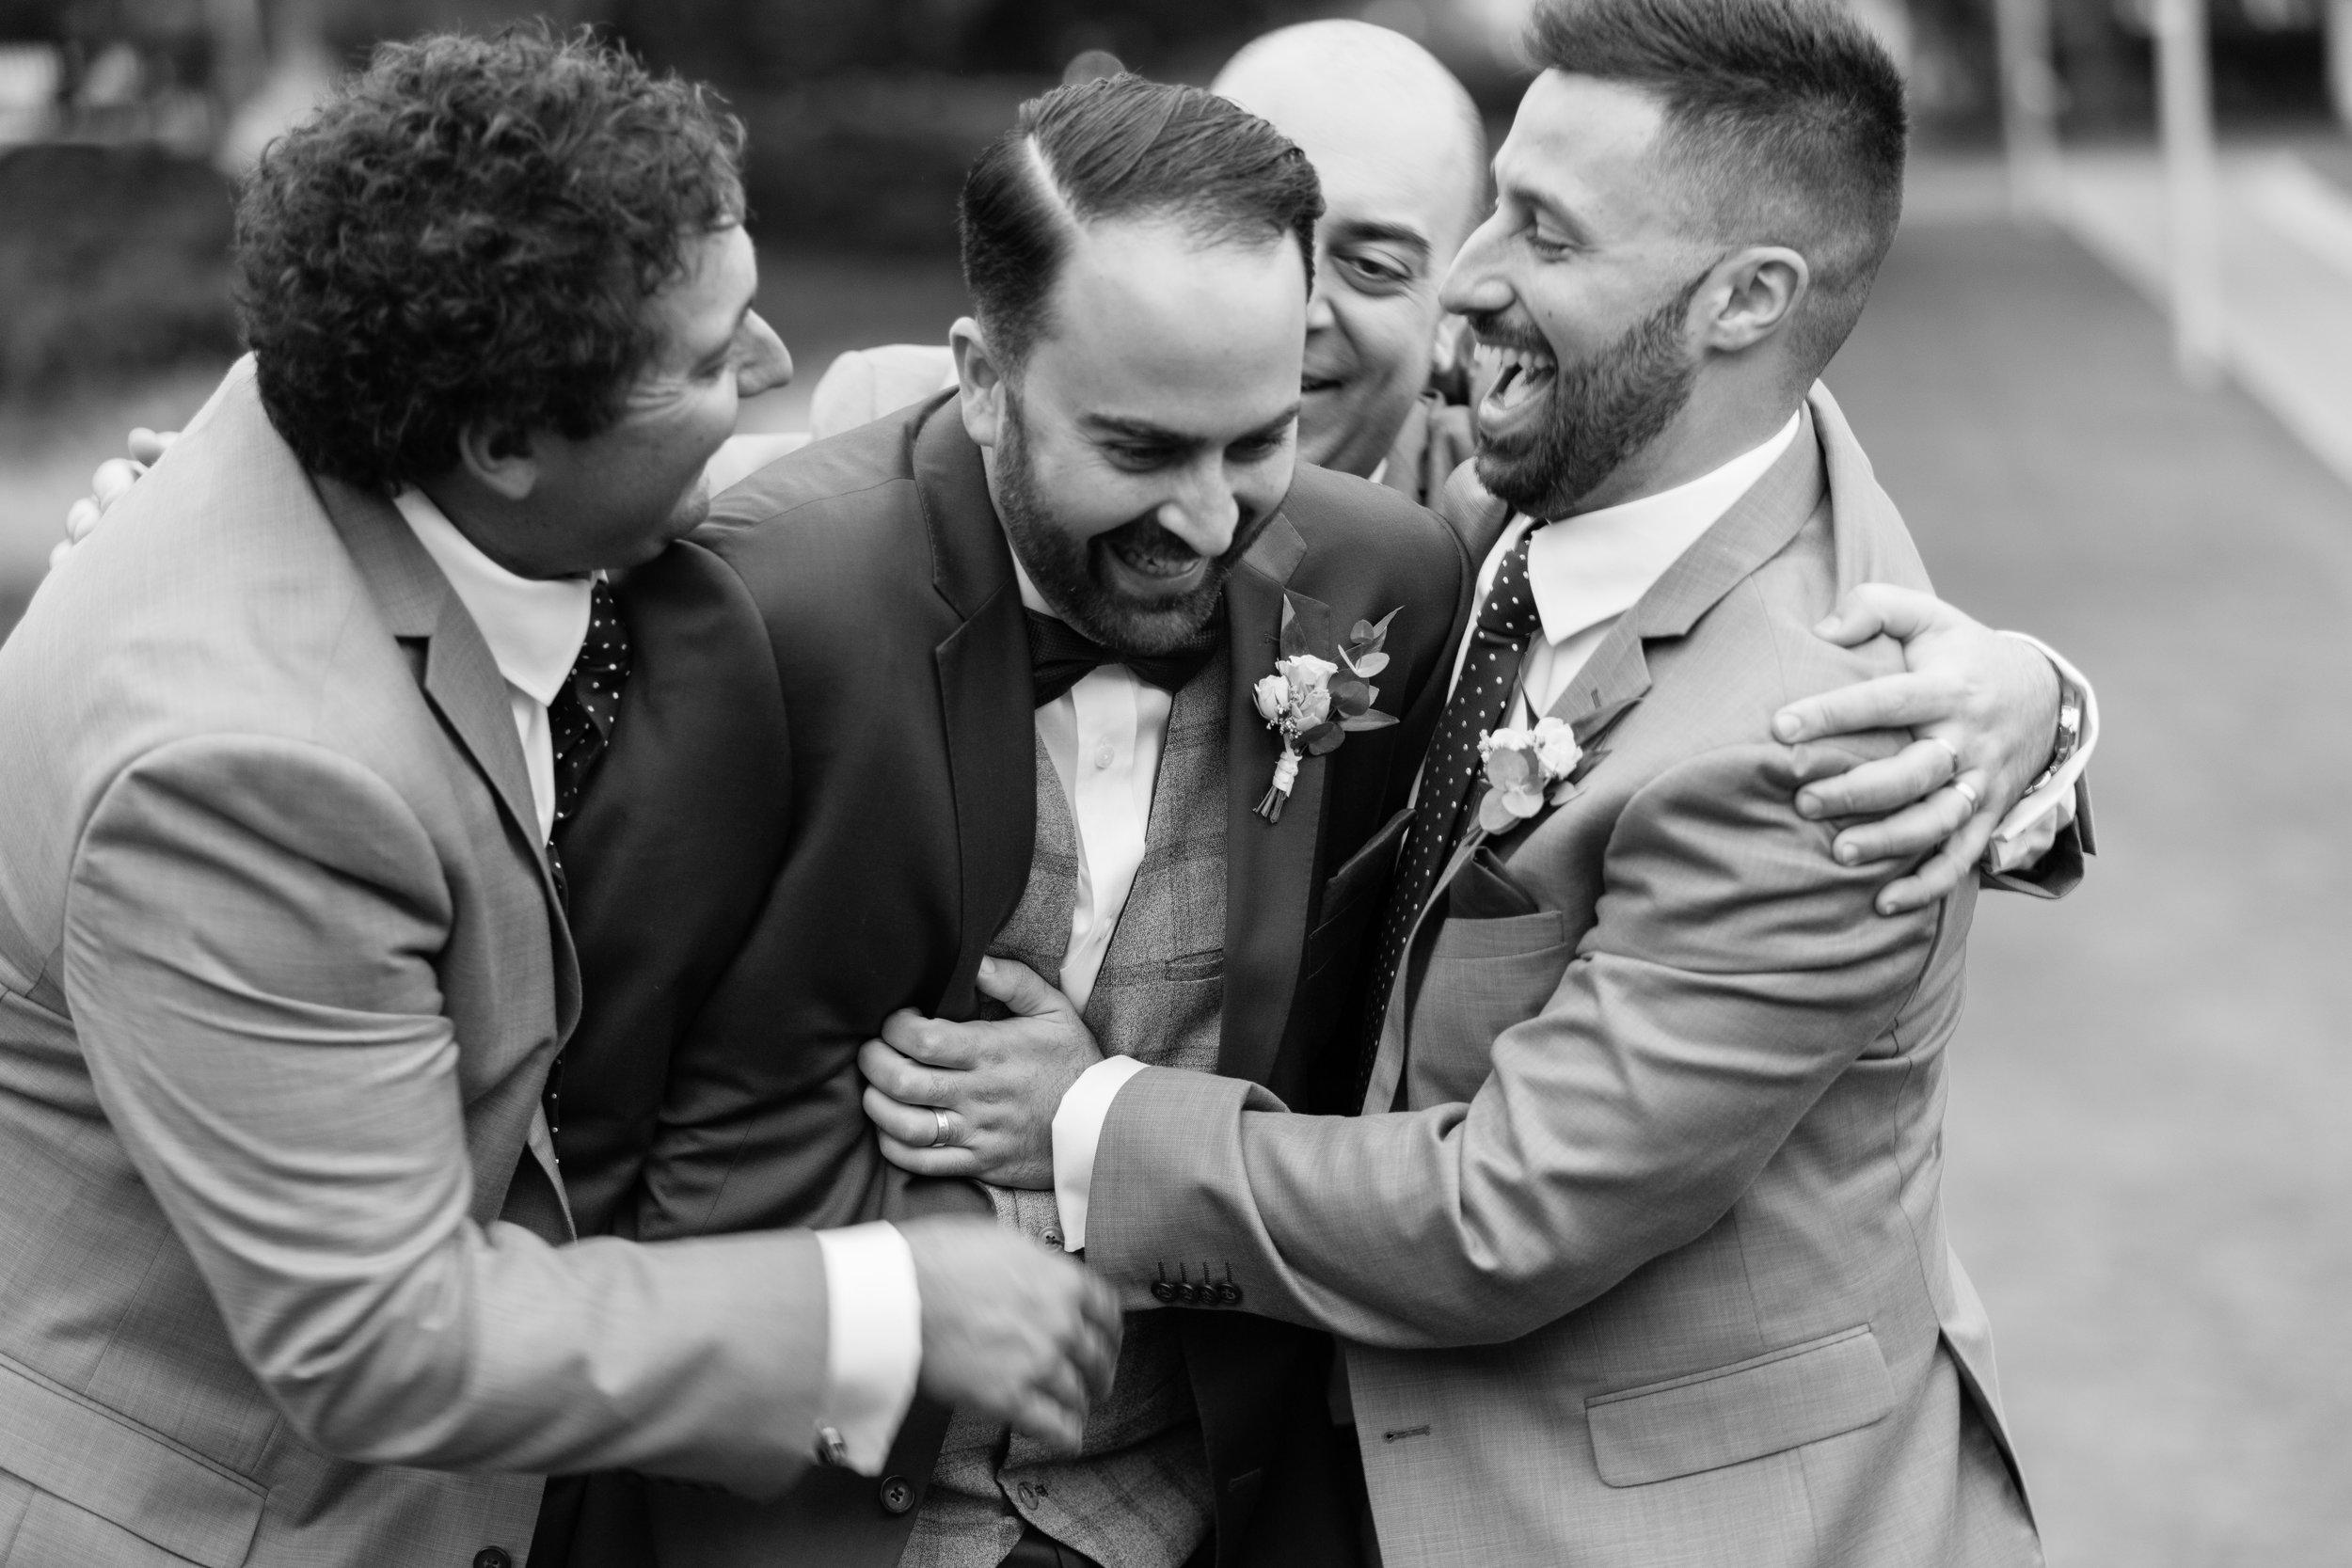 brisbane-city-wedding-photographer-romantic-wedding-69.jpg